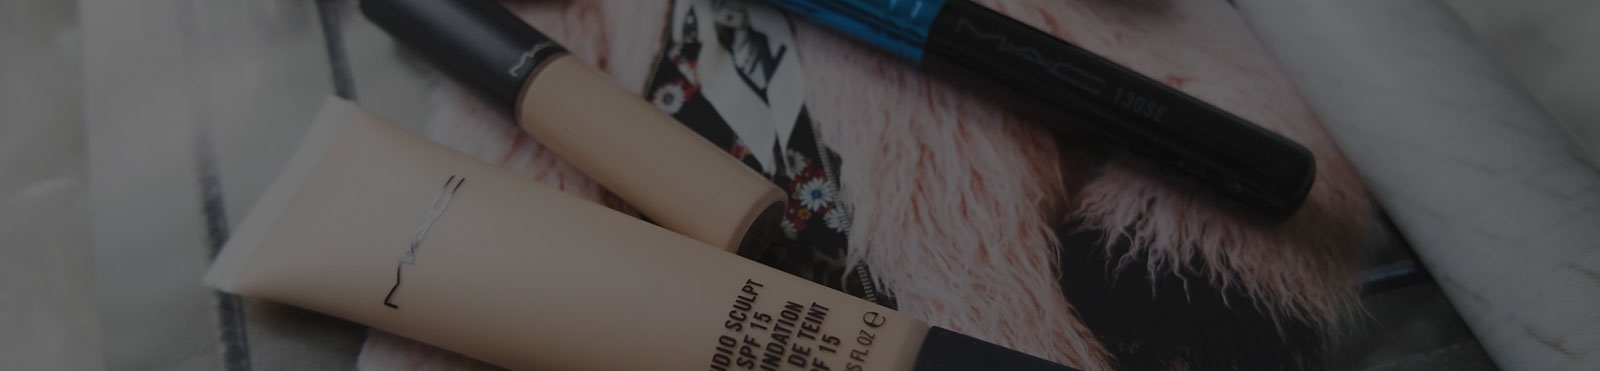 hairsalon banner